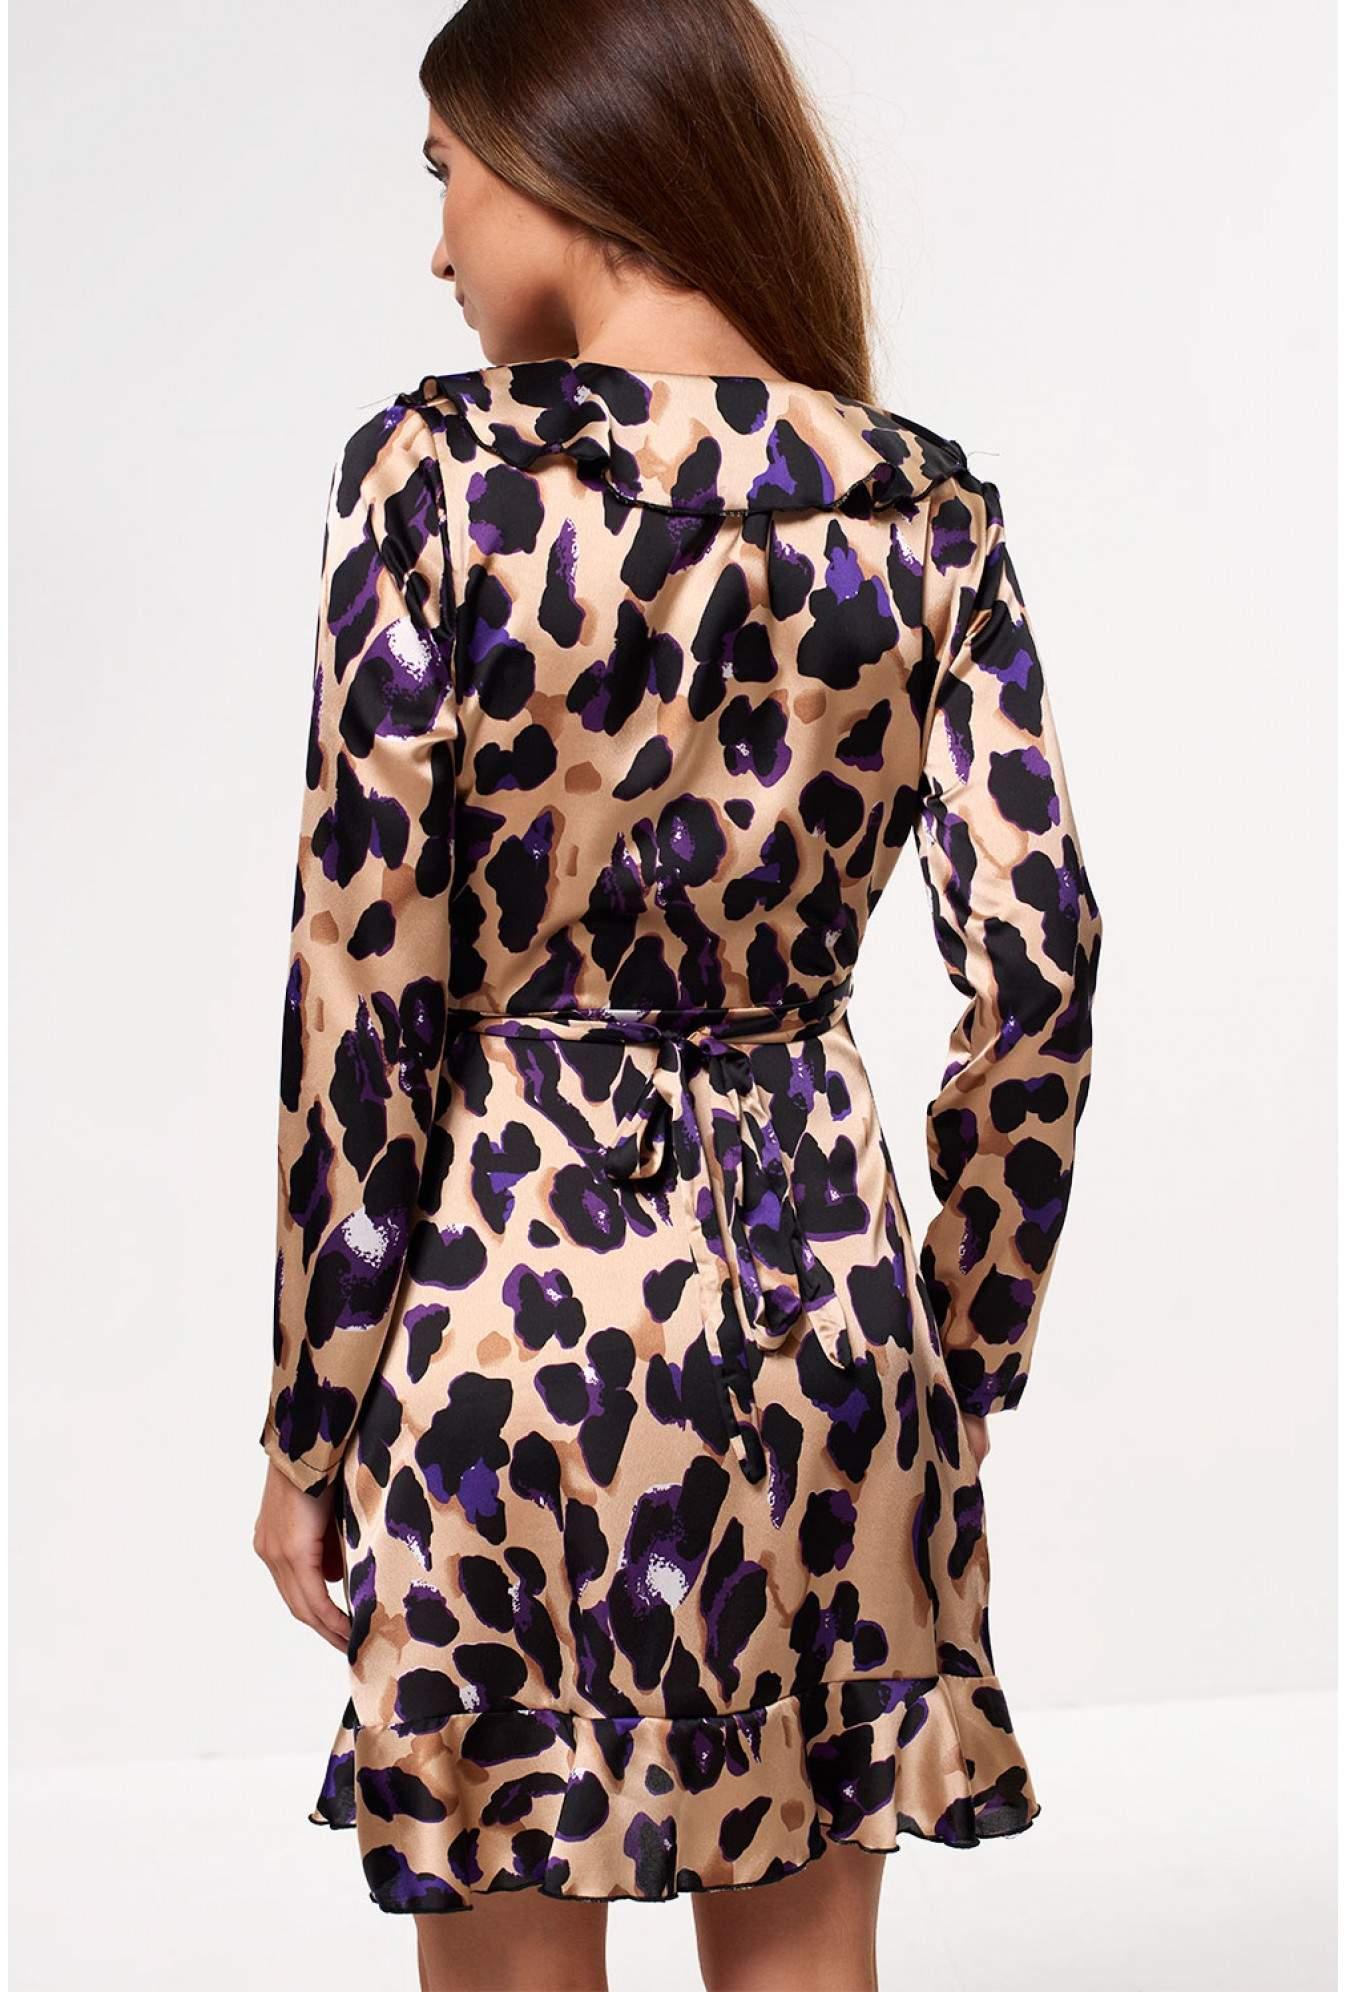 1f75a26dbb14 John Zack Kate Frill Wrap Dress in Purple Leopard Print   iCLOTHING